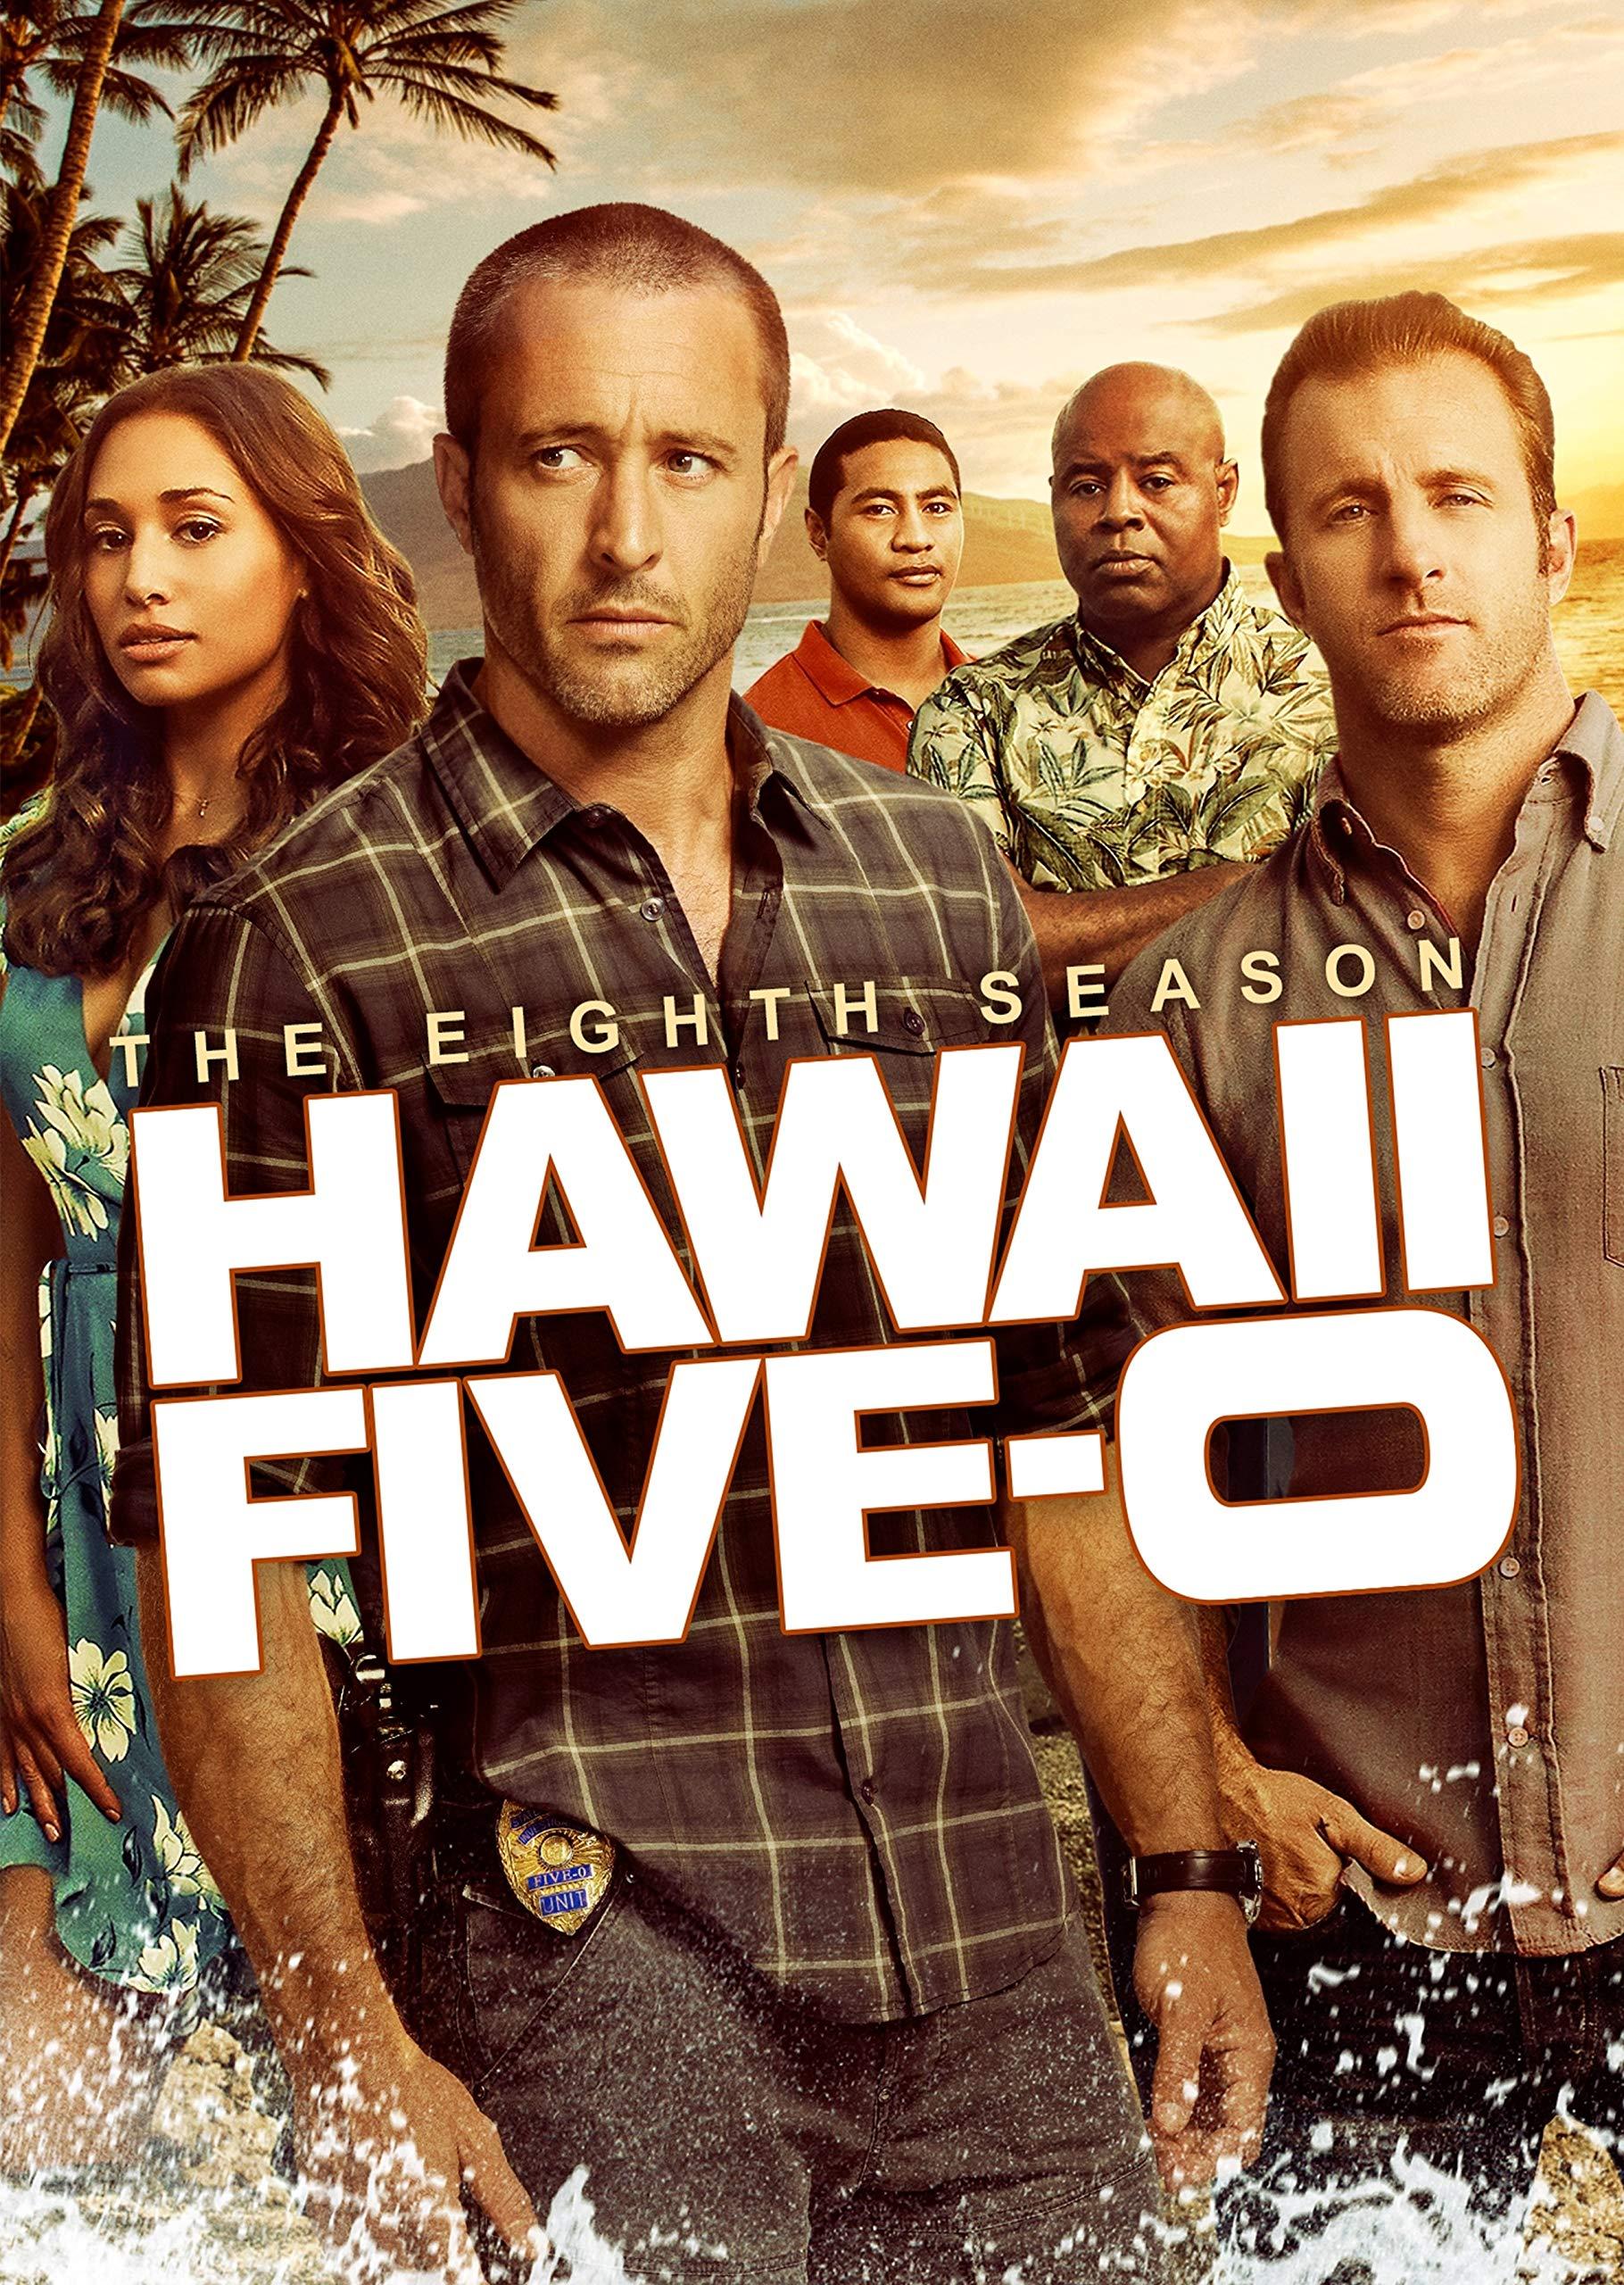 Hawaii Five-O (2010): The Eighth Season